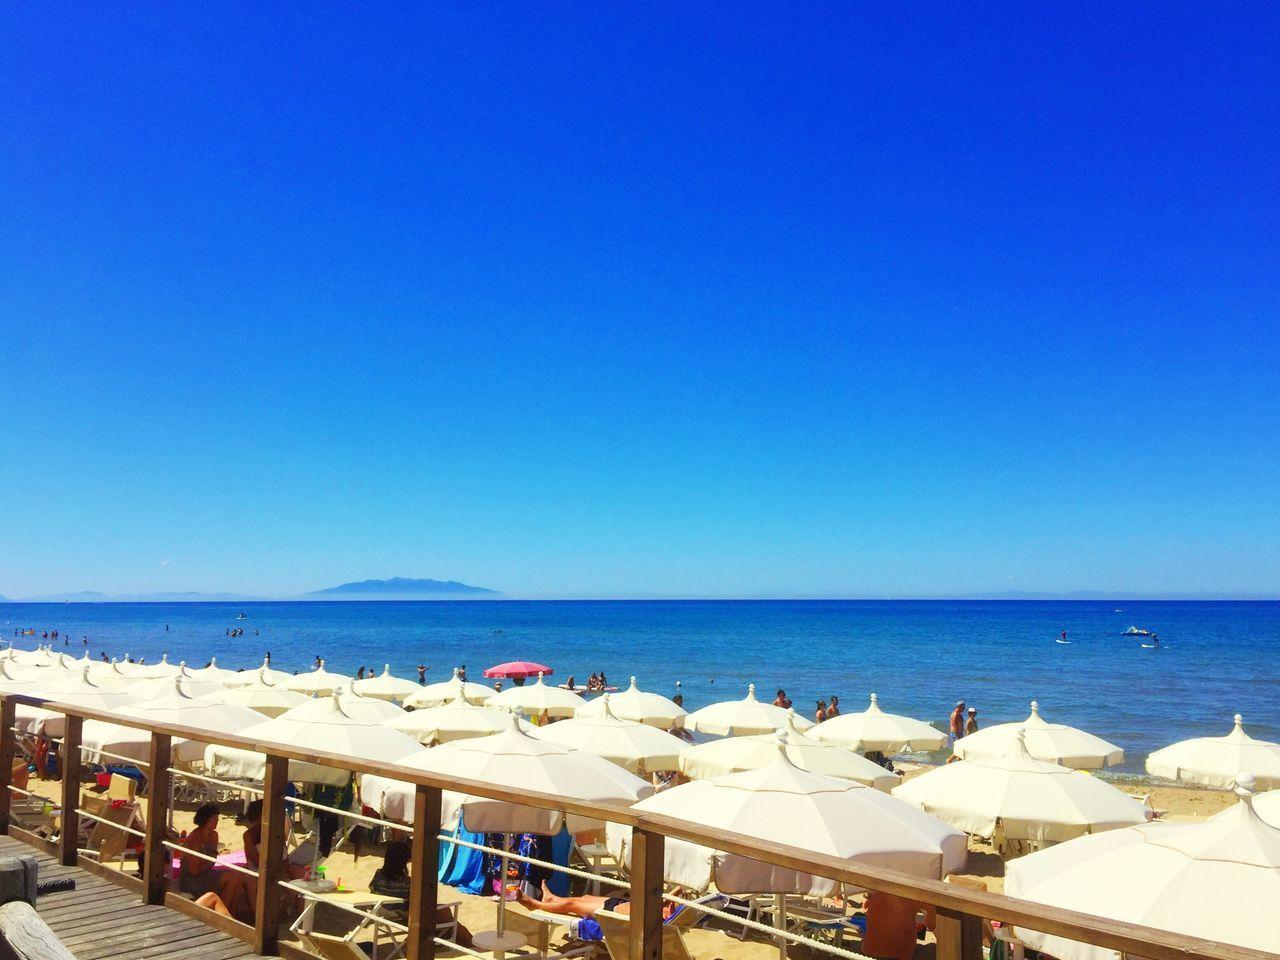 Live For The Story Sea Beach Shore Horizon Over Water Sand Blue Summer Vacations Lido Italian Riviera Summertime Summer Views Endlesssummer